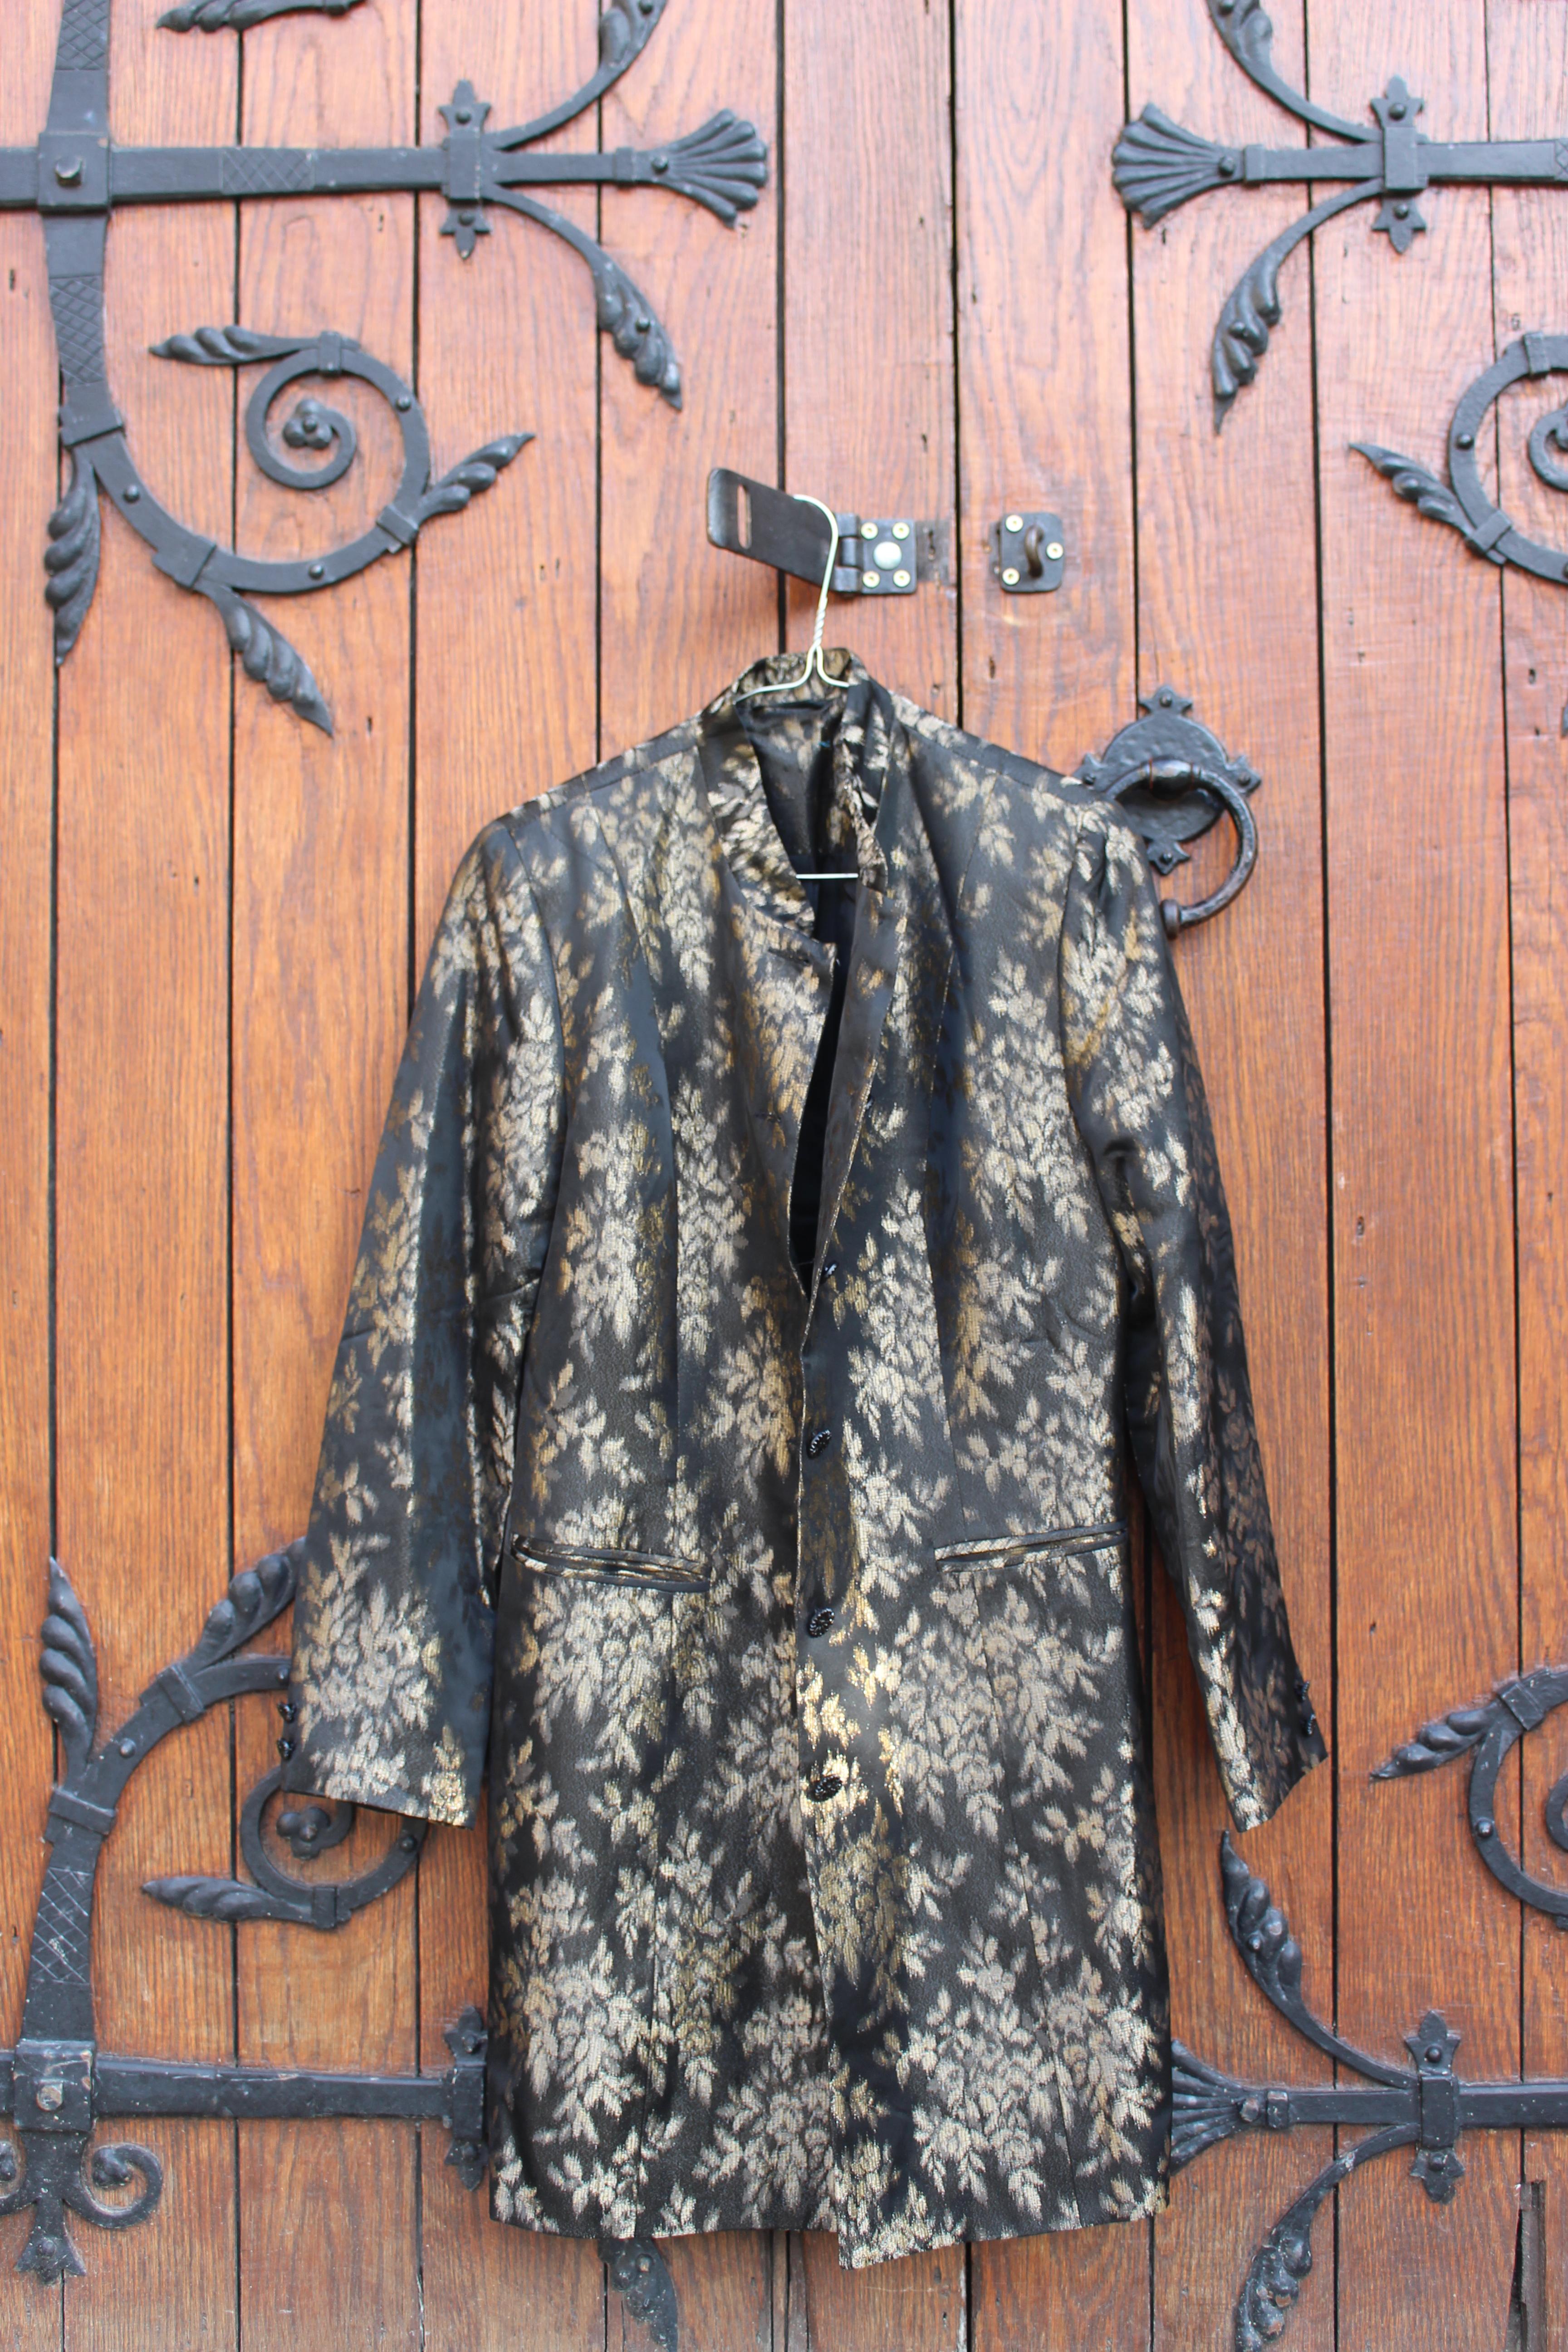 Black and gold brocade jacket